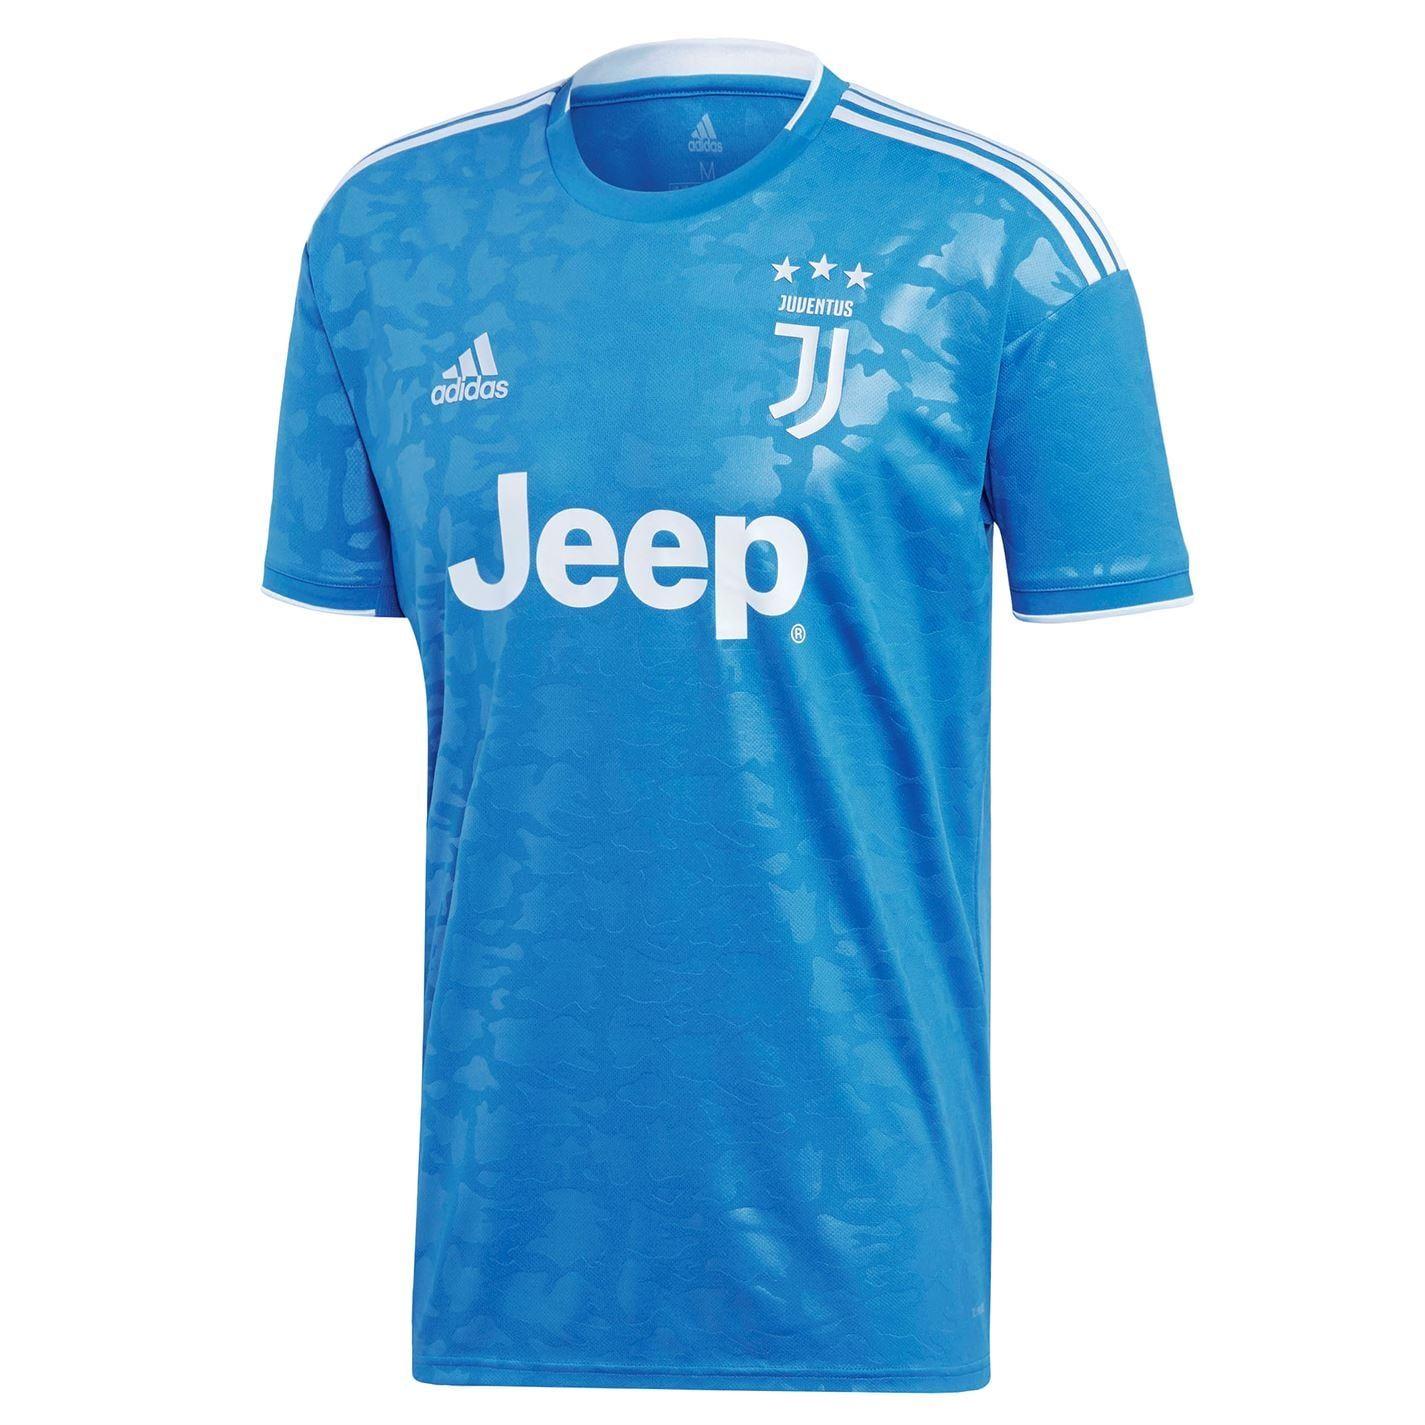 Detalles de Adidas Juventus Tercera Camisa 2019 2020 Hombres Azul Fútbol Camiseta